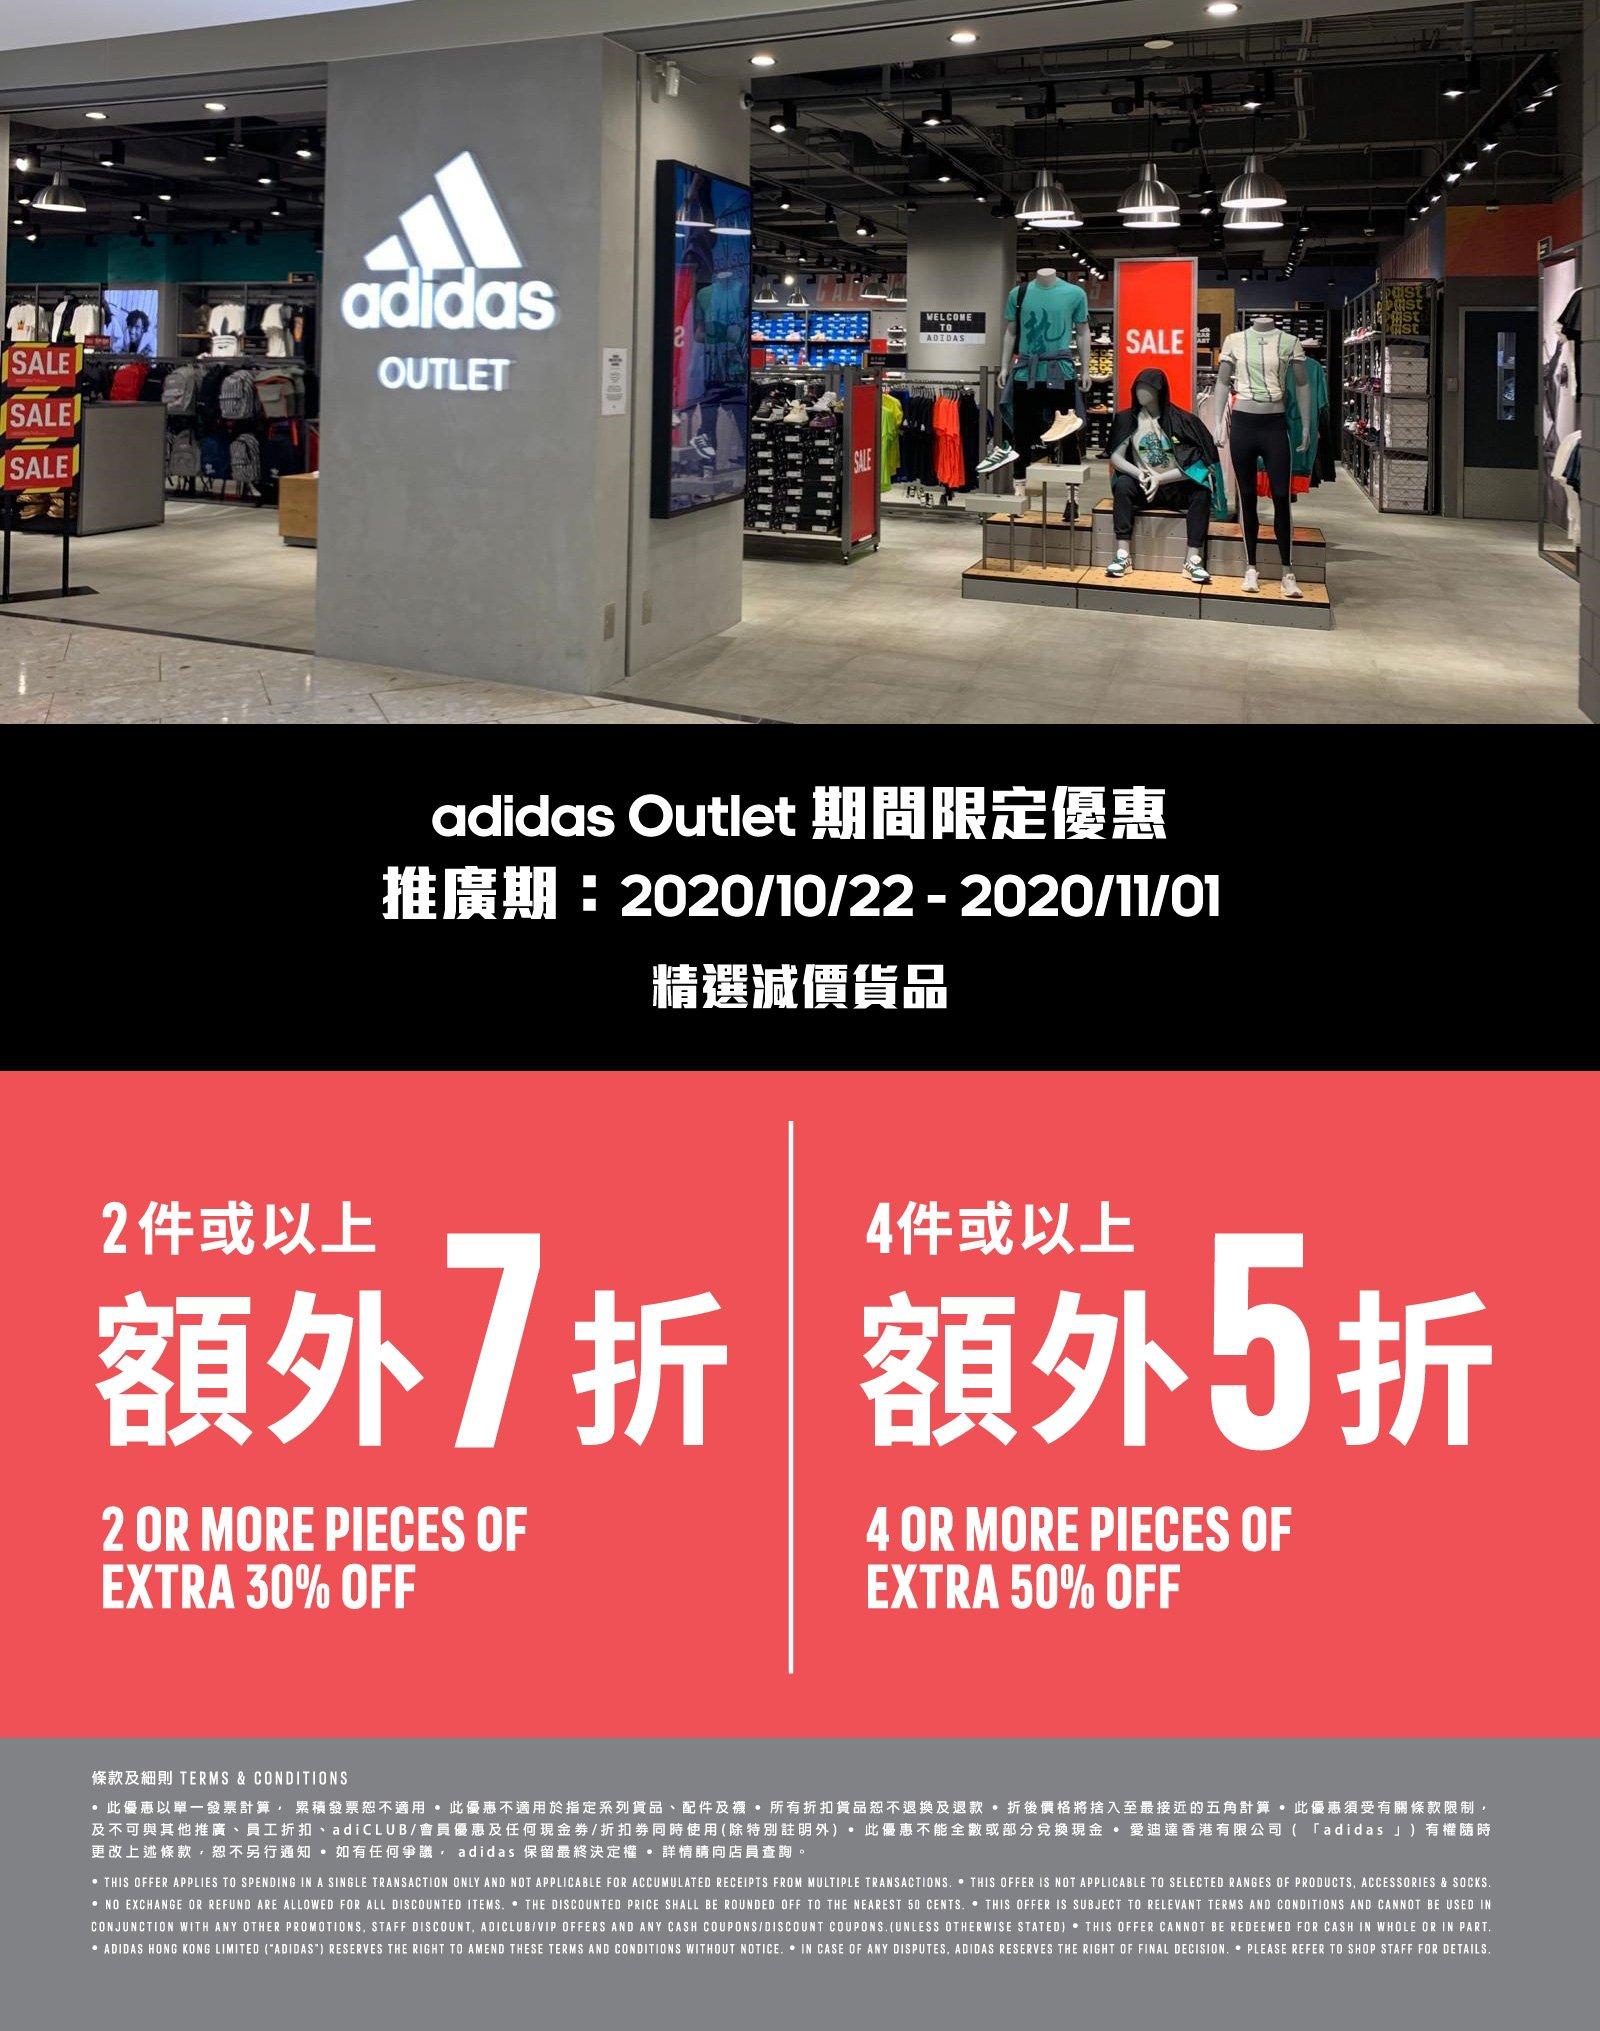 Adidas HK: 【adidas Outlet期間限定優惠